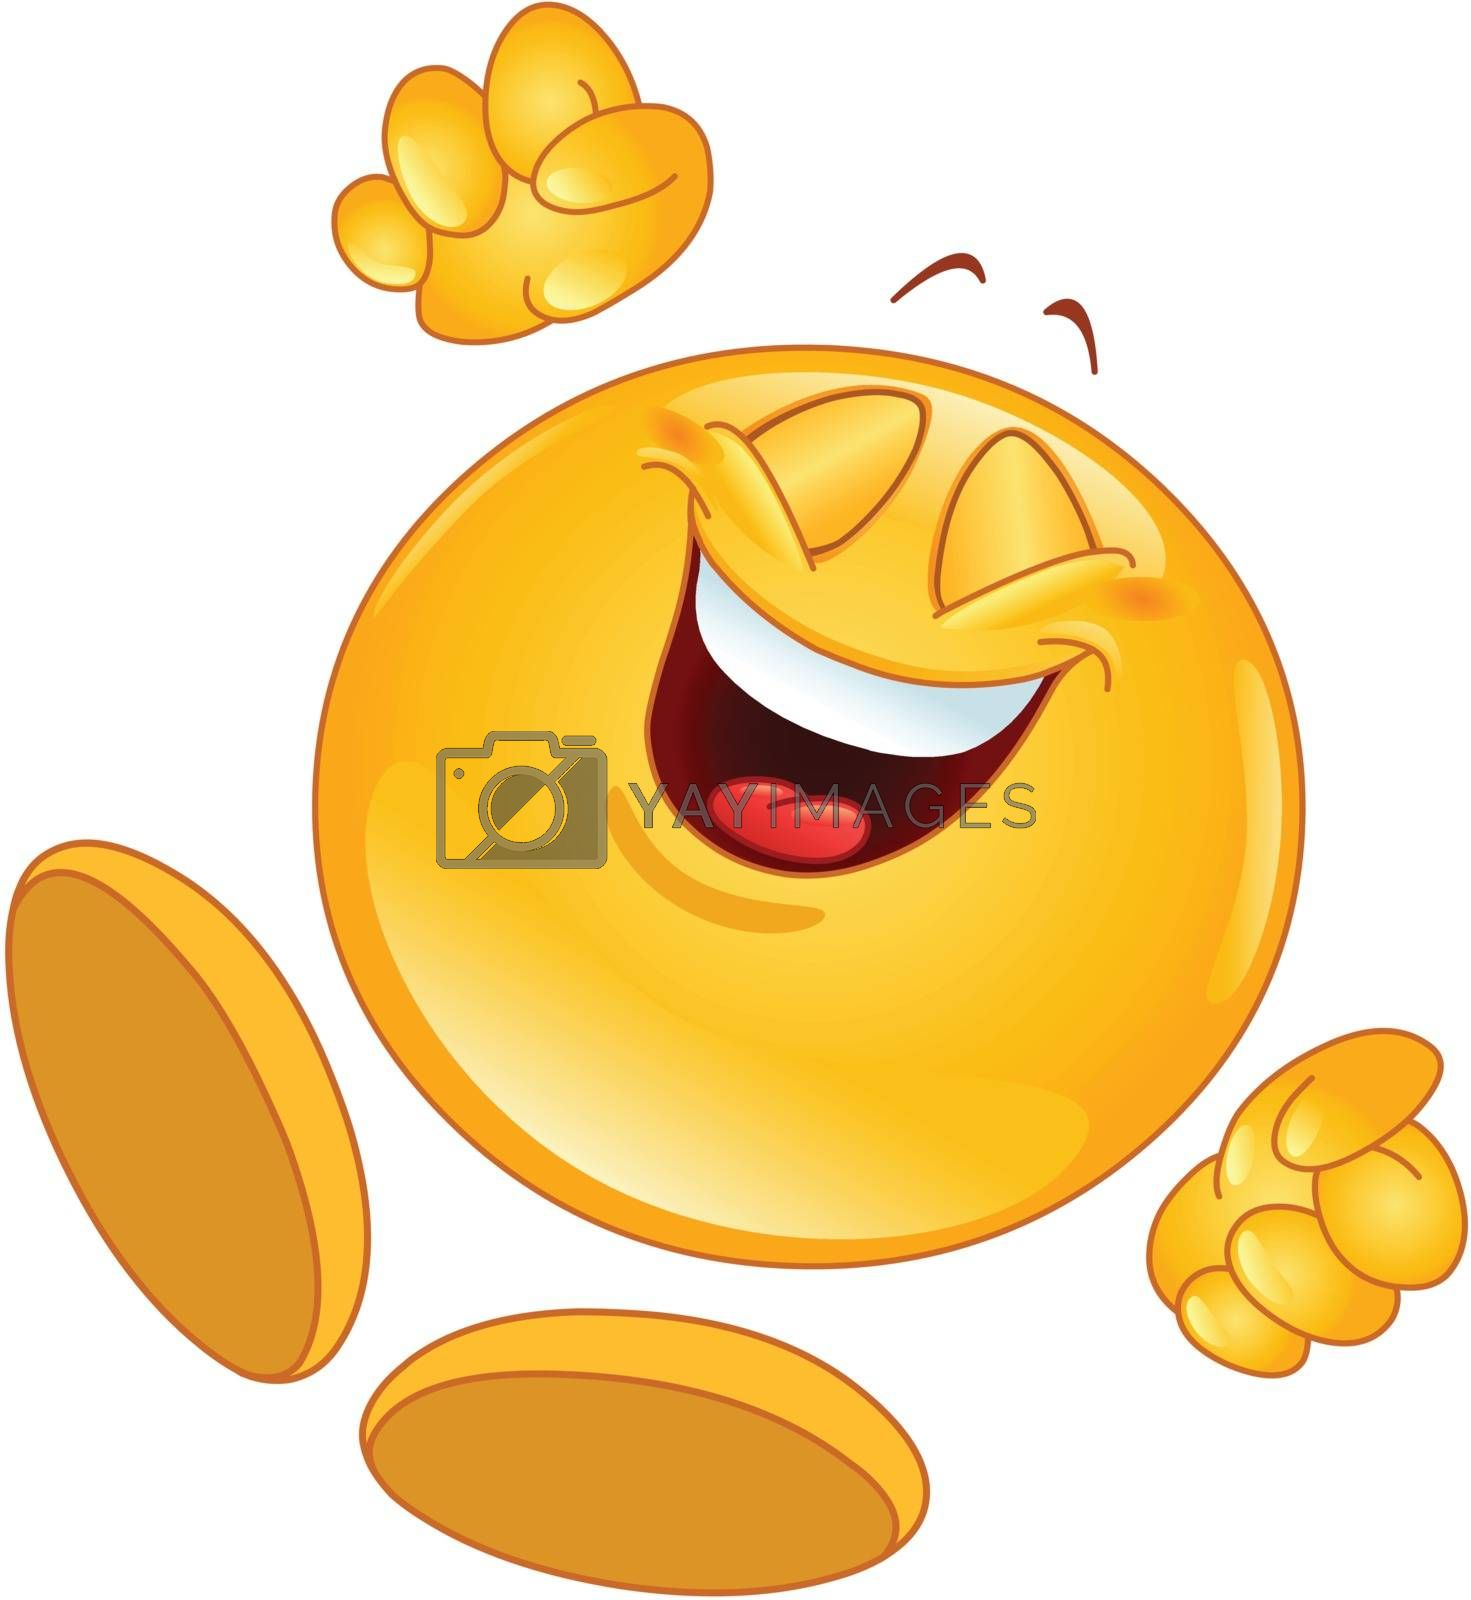 Royalty free image of Cheerful emoticon by yayayoyo